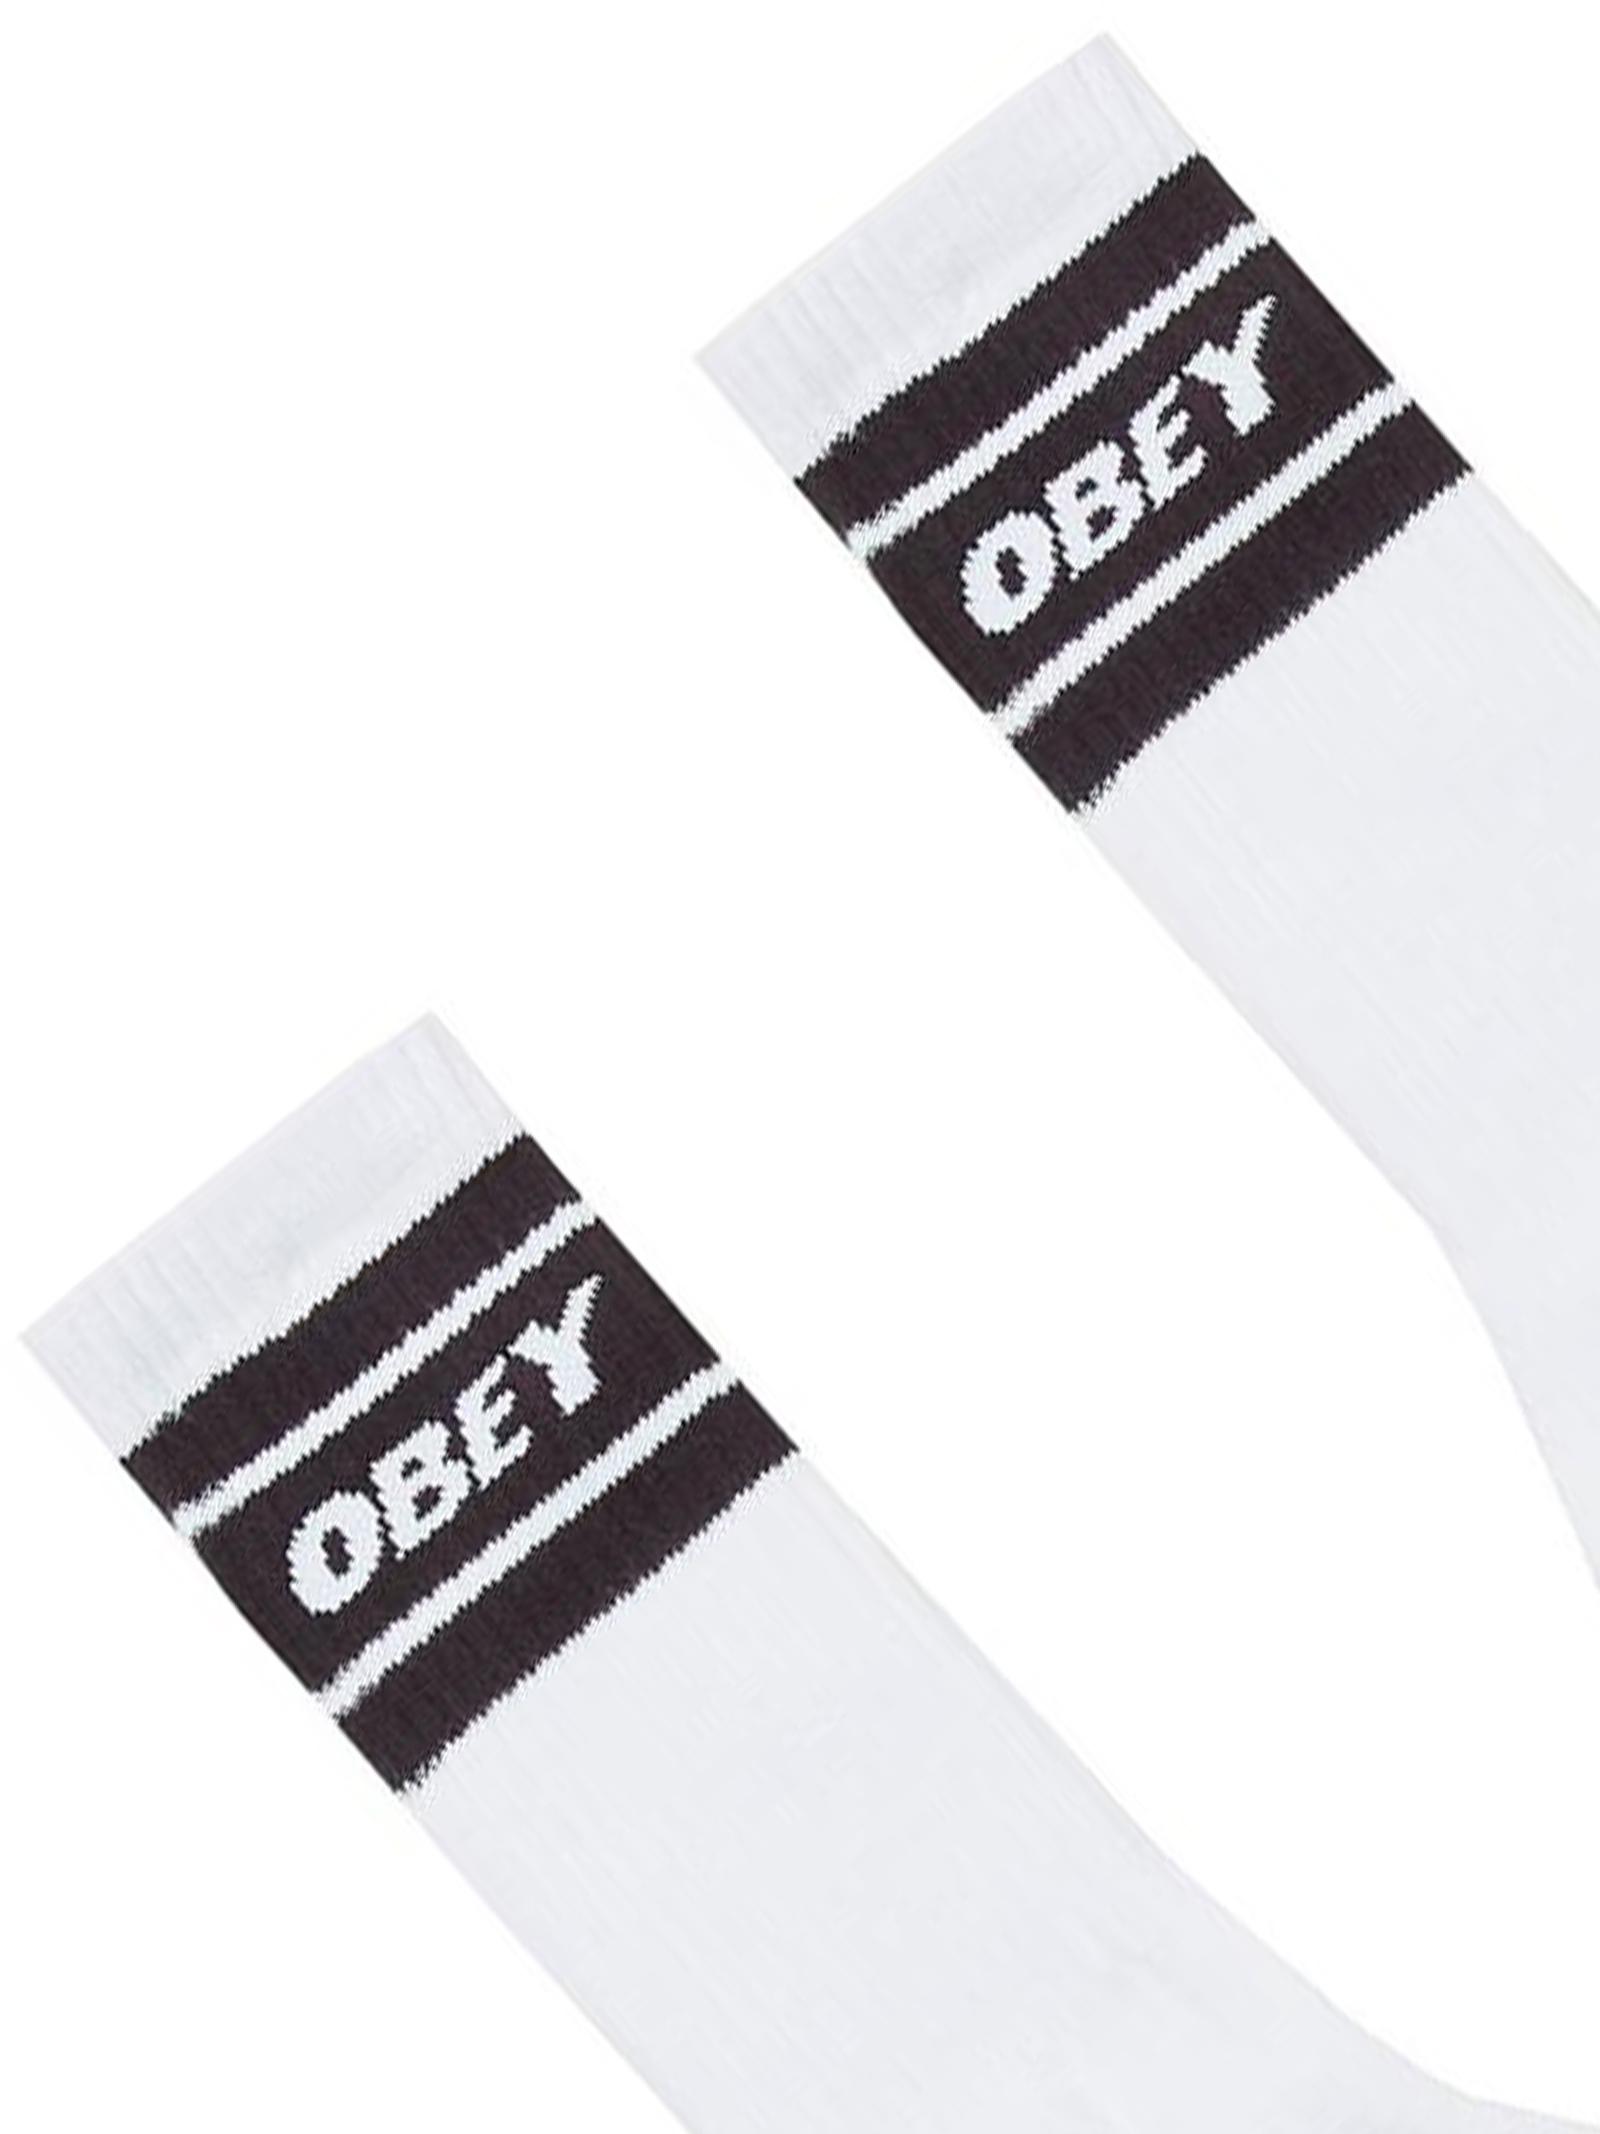 oBEY      22121MA000050WHITW